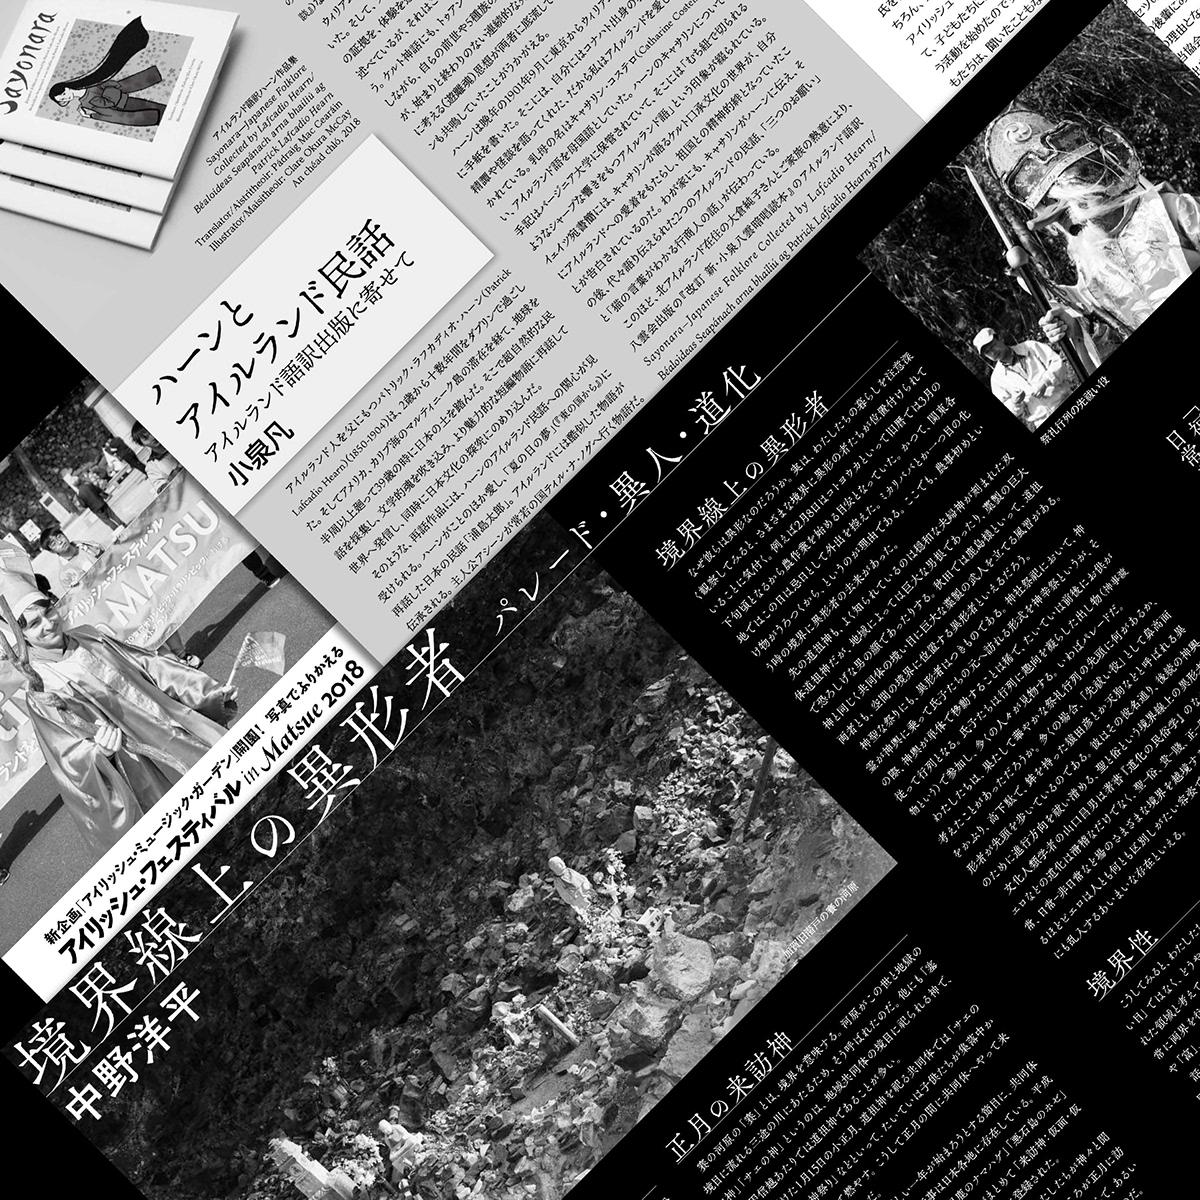 Sanin Japan-Ireland Association matsue Ishikawa Kiyoharu Ireland 山陰日本アイルランド協会 高浜印刷 Takahama Printing 石川陽春